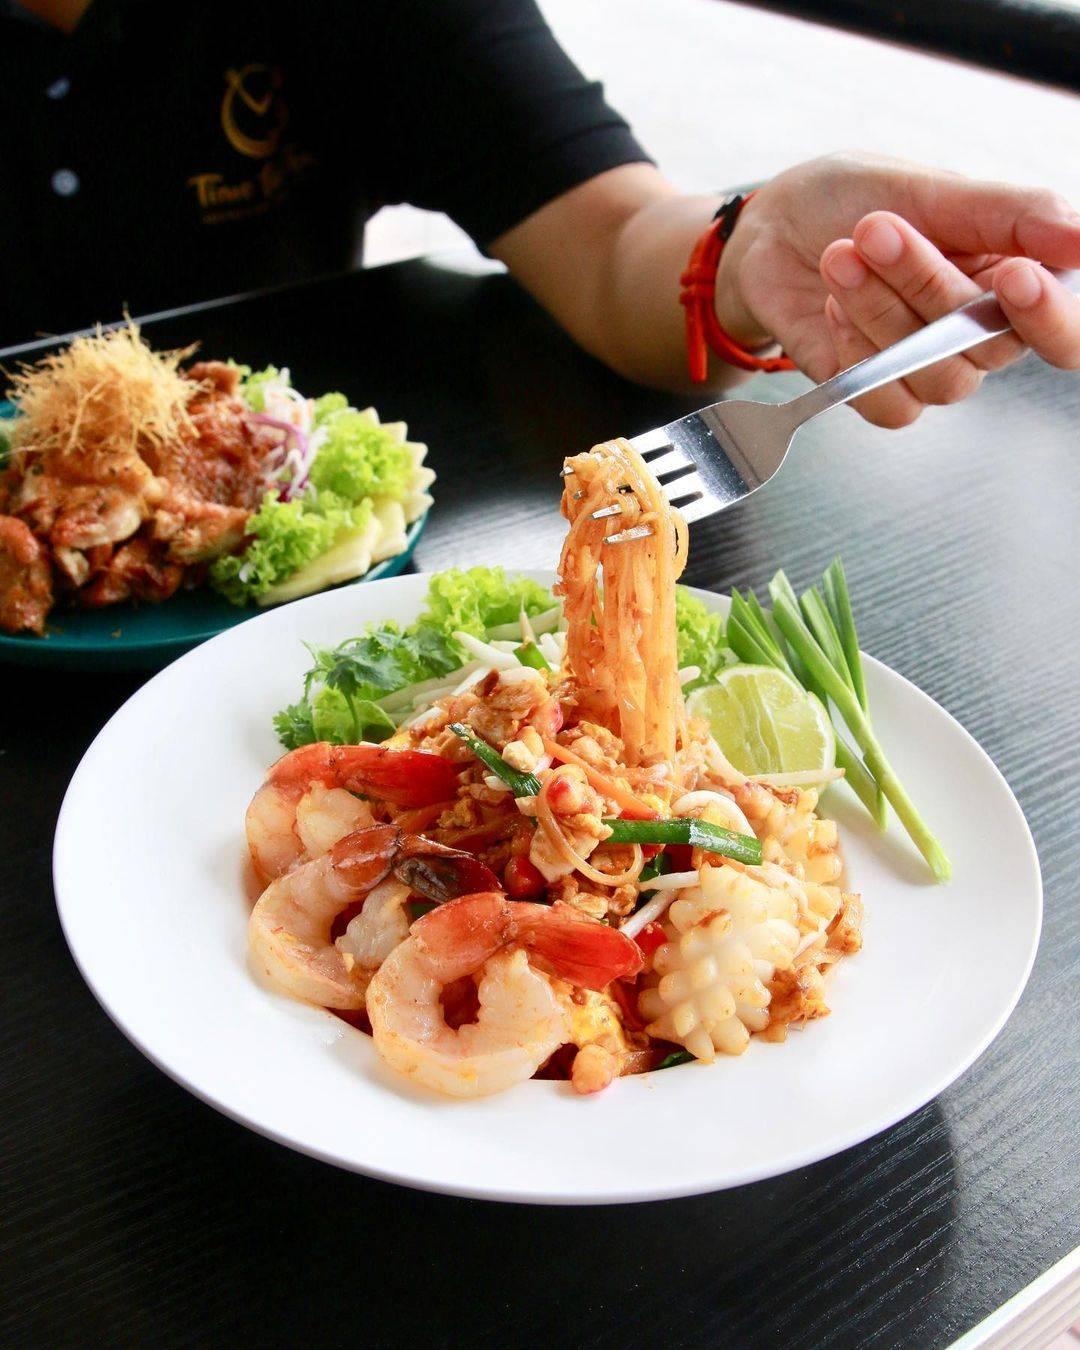 Best Halal Thai Food Singapore - Phad Thai at Time for Thai